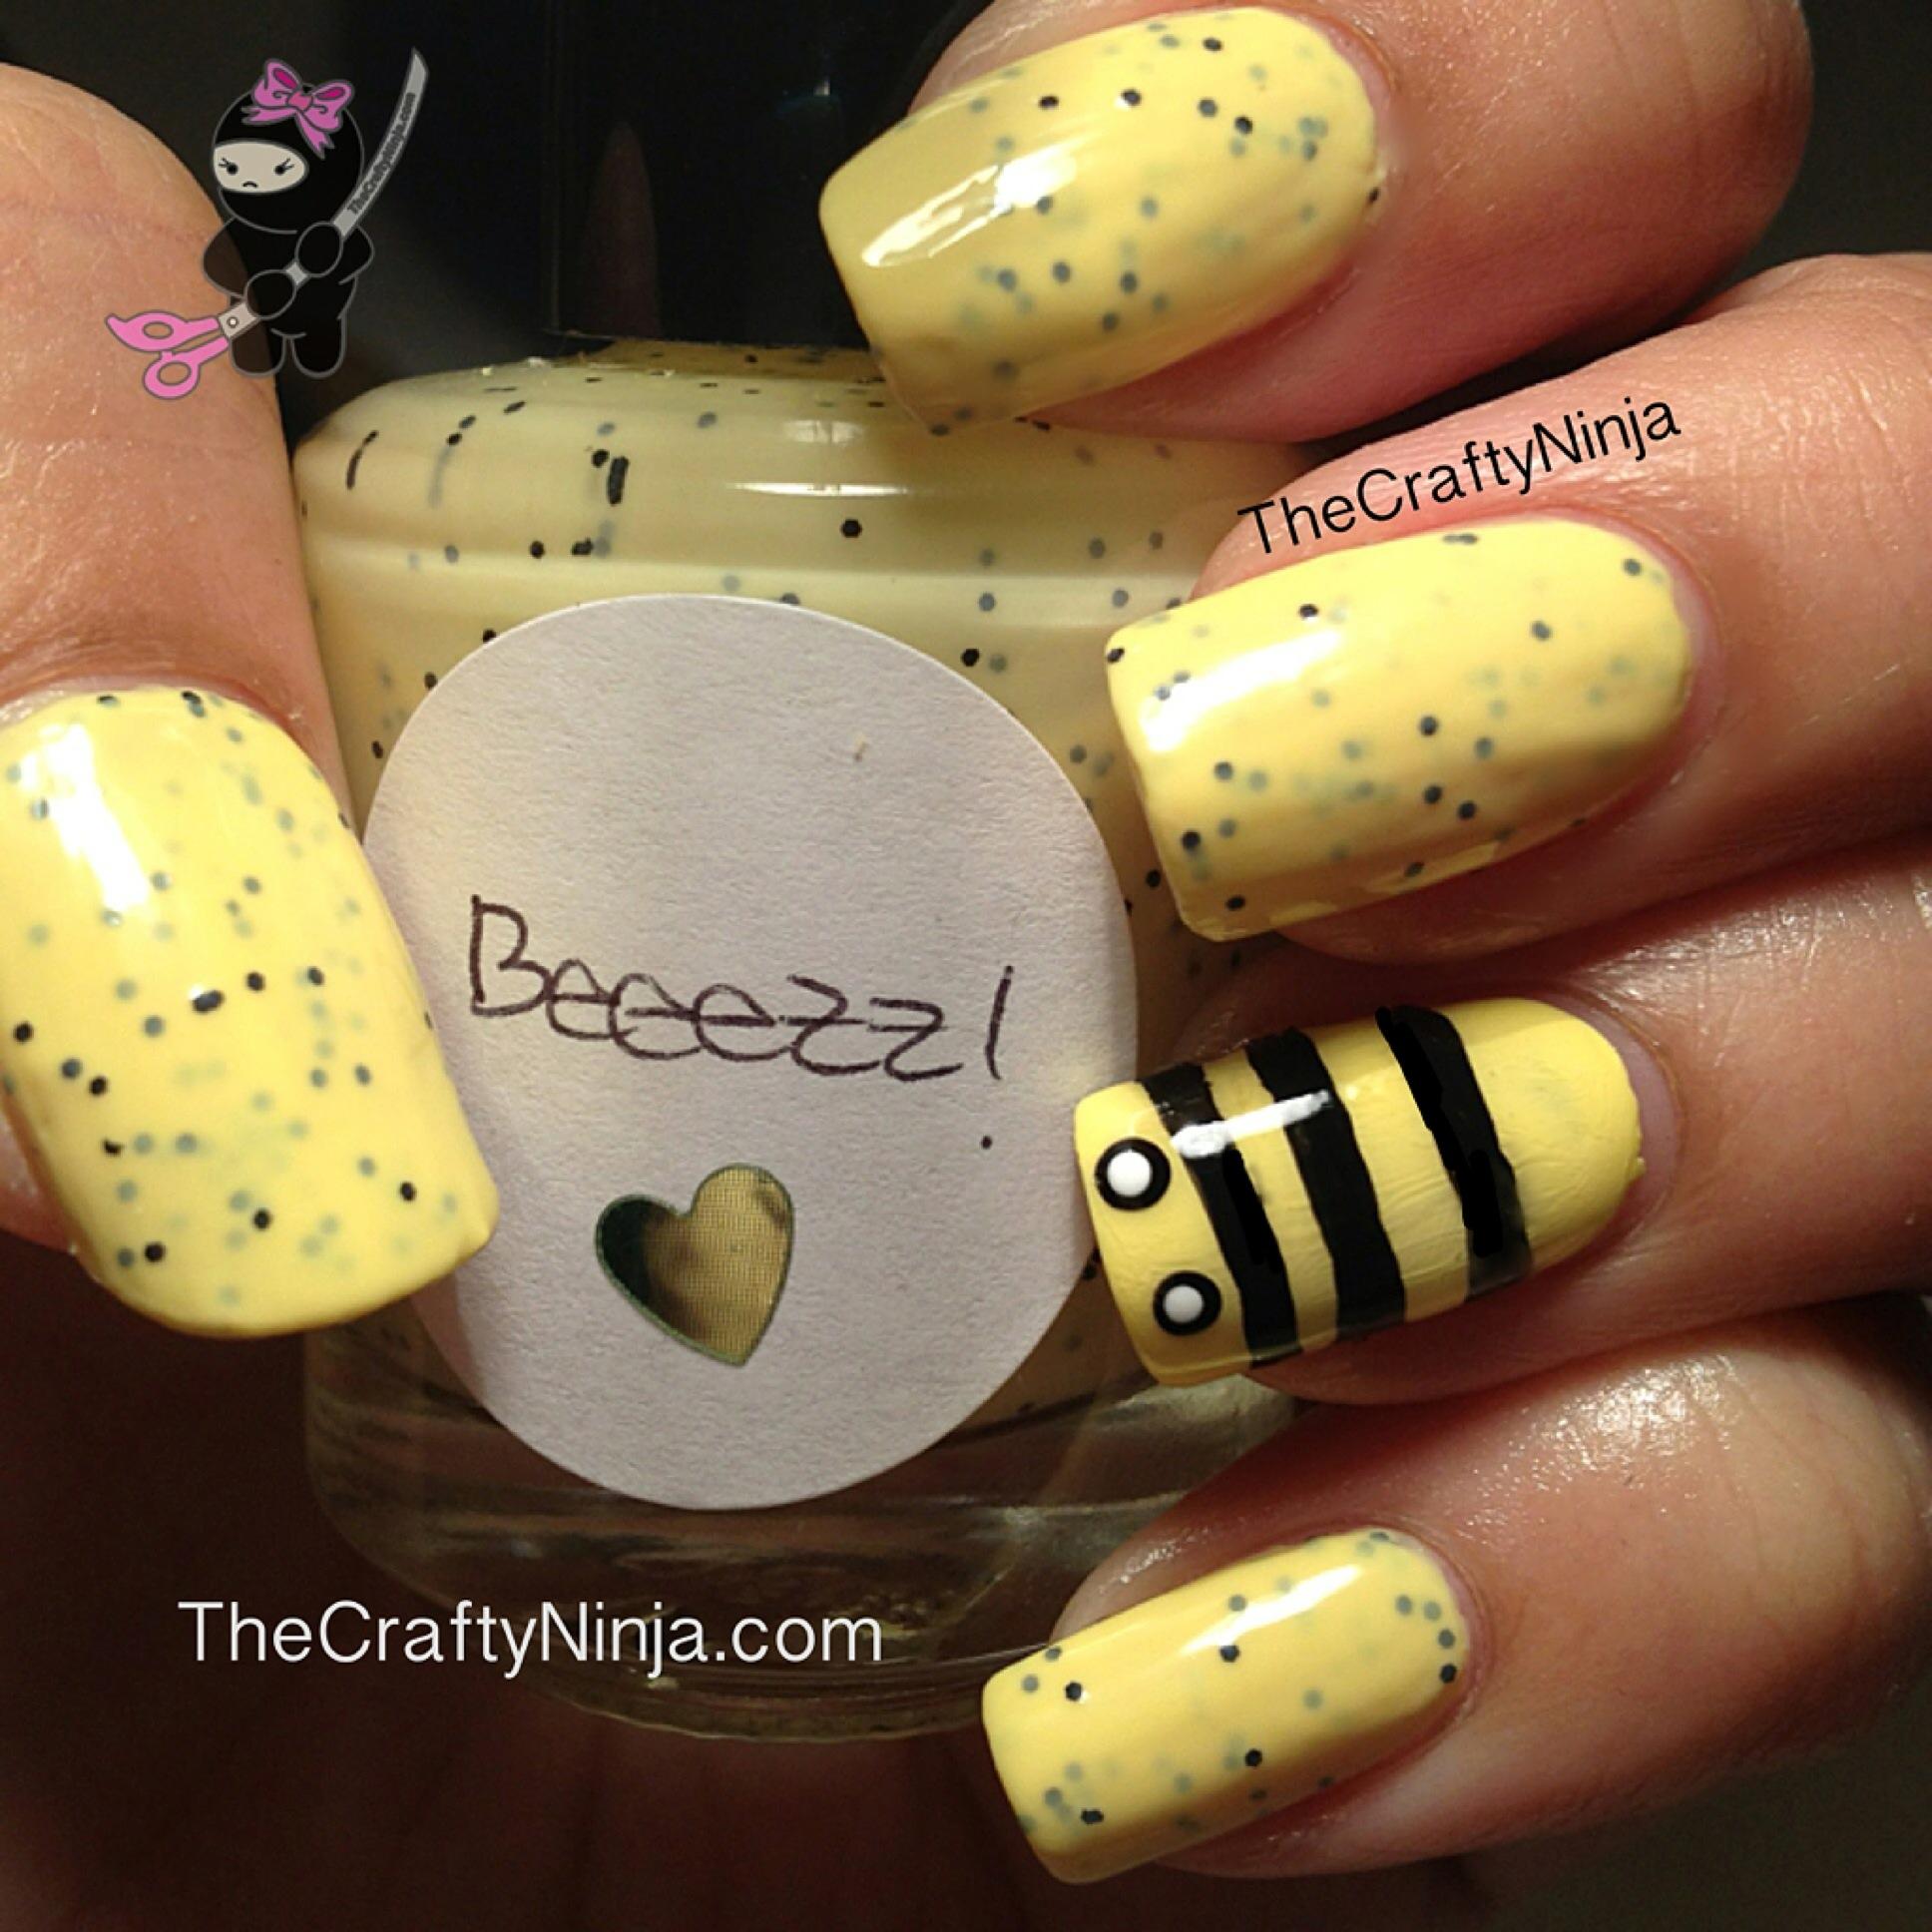 Bumble Bee Nails The Crafty Ninja